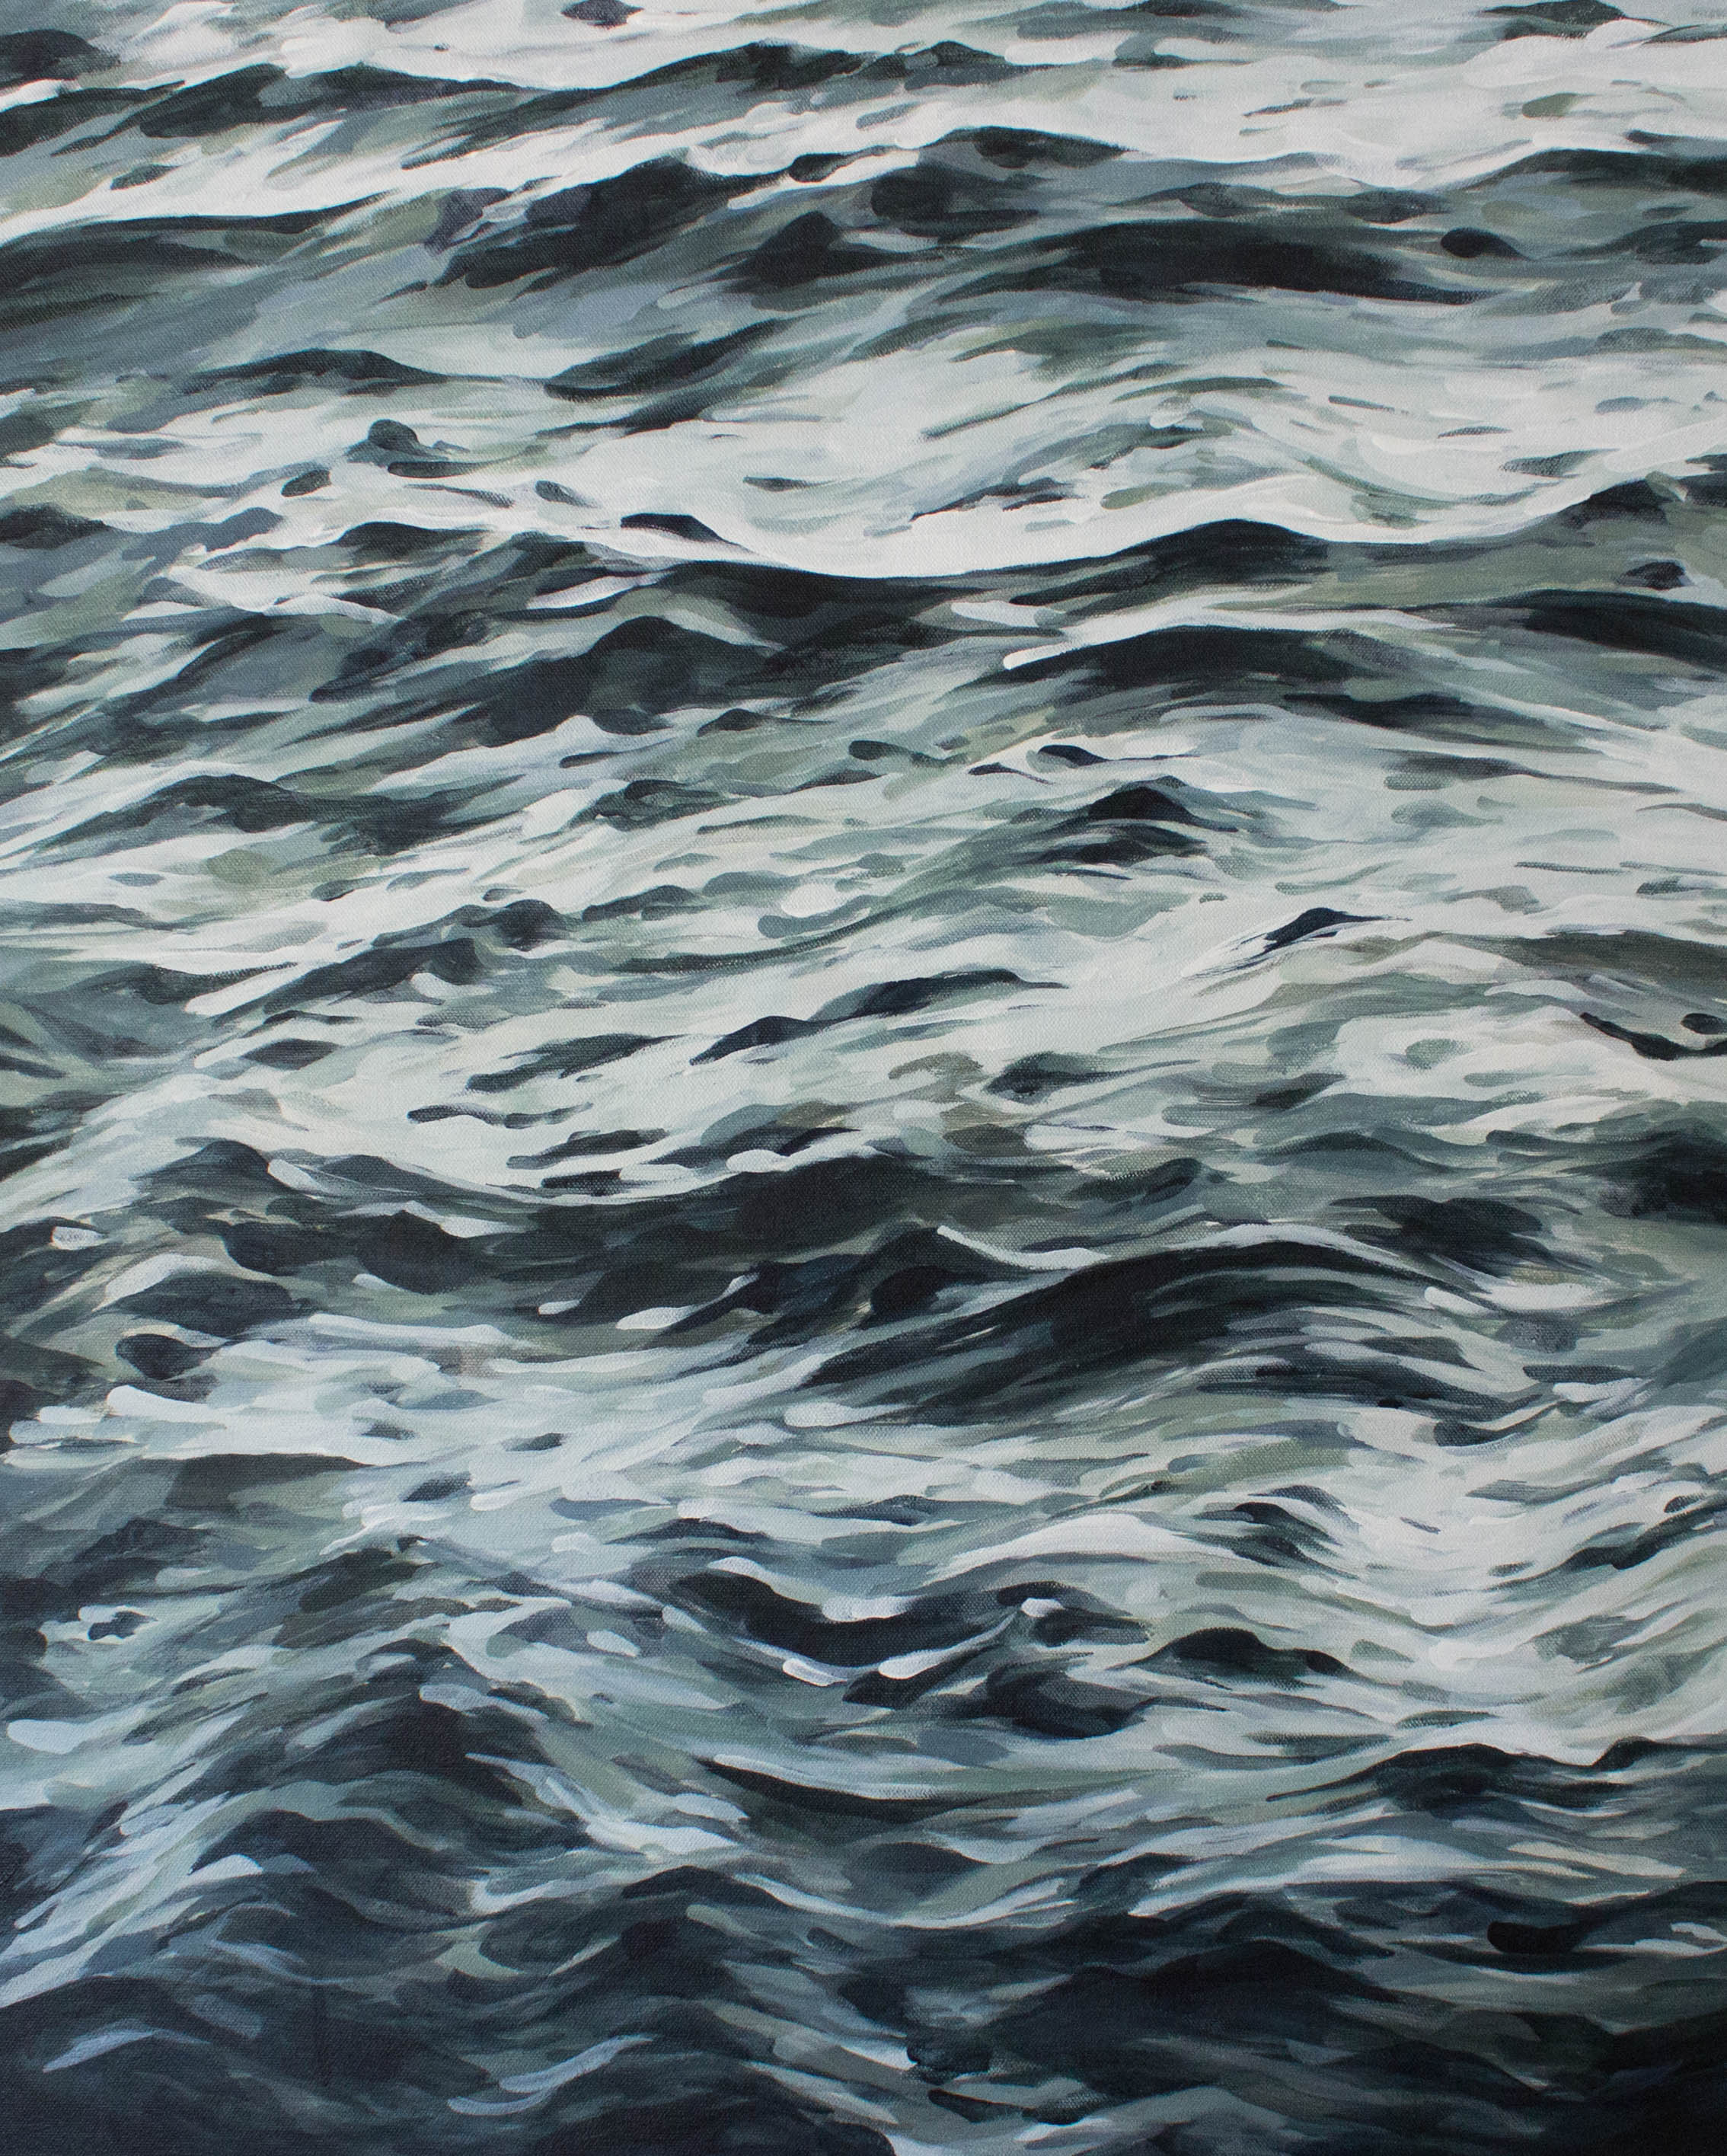 """Consistency"" 24x30"" acrylic on canvas"